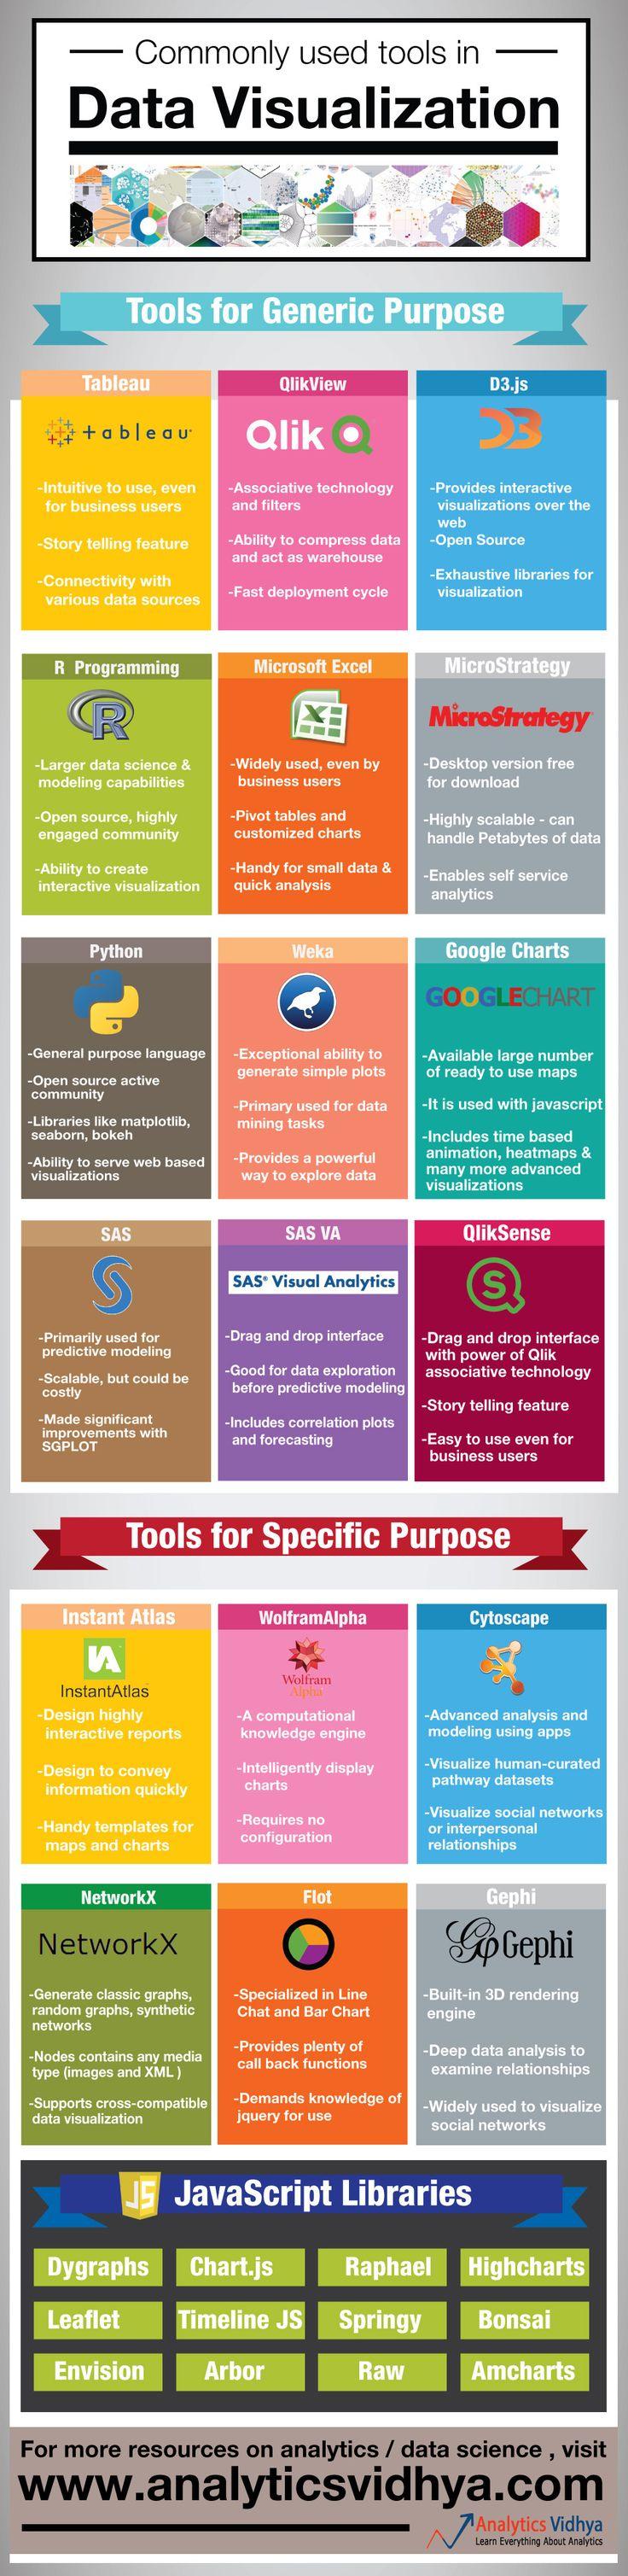 Data Visualization : Social media data mining | The Digital Media Strategy Blog